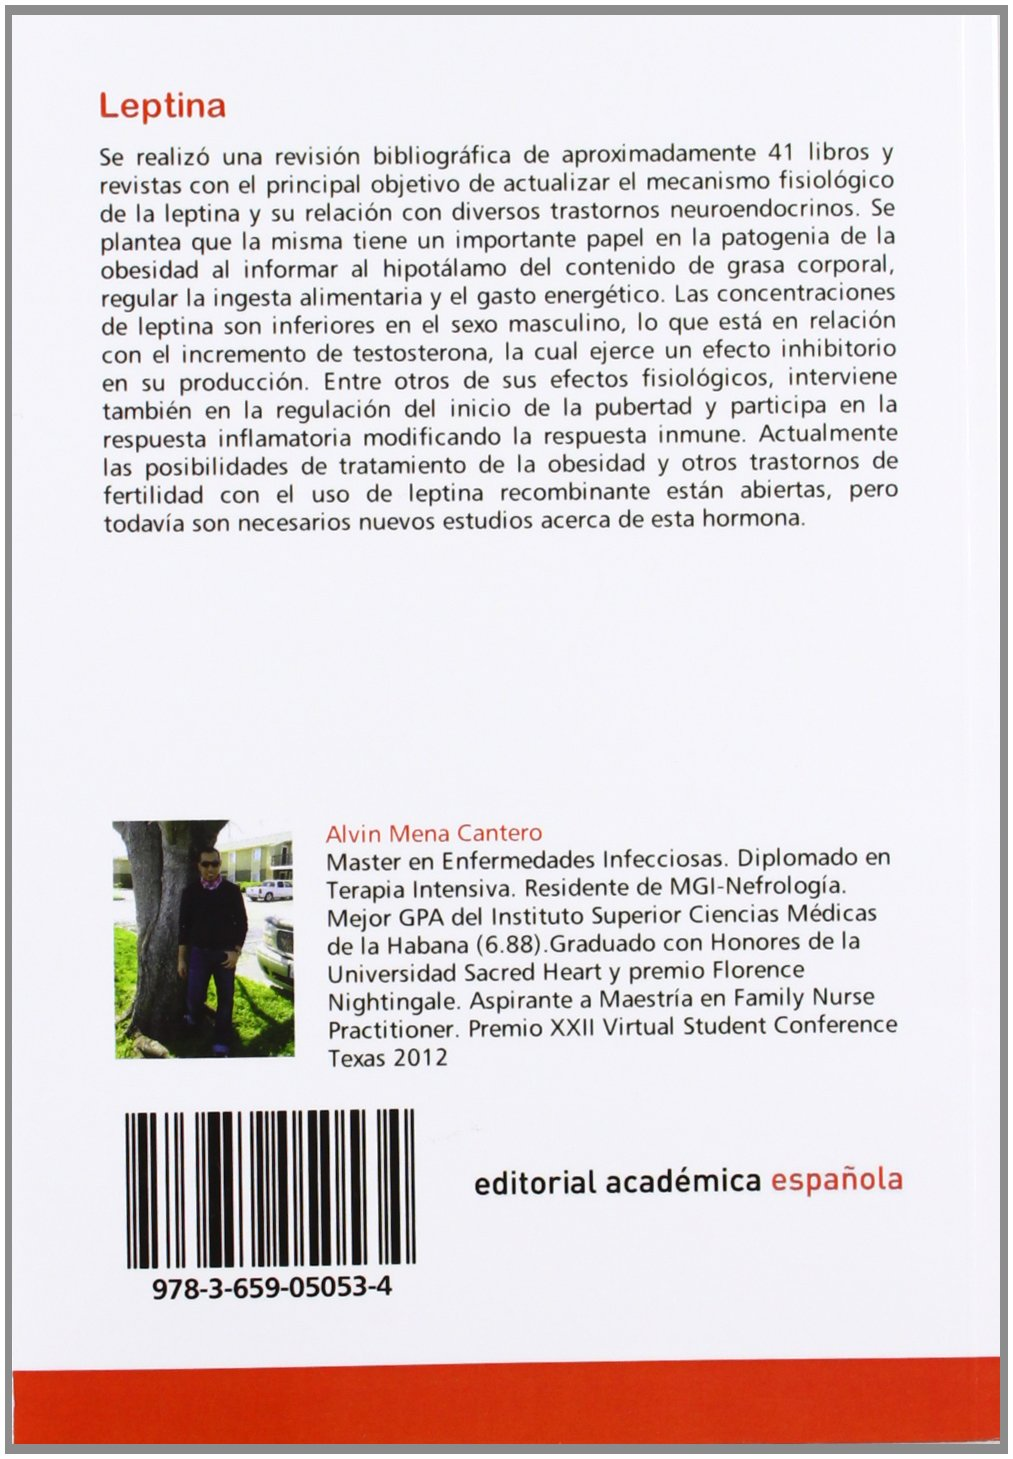 Leptina: Acercamiento a una hormona (Spanish Edition): Alvin Mena Cantero: 9783659050534: Amazon.com: Books